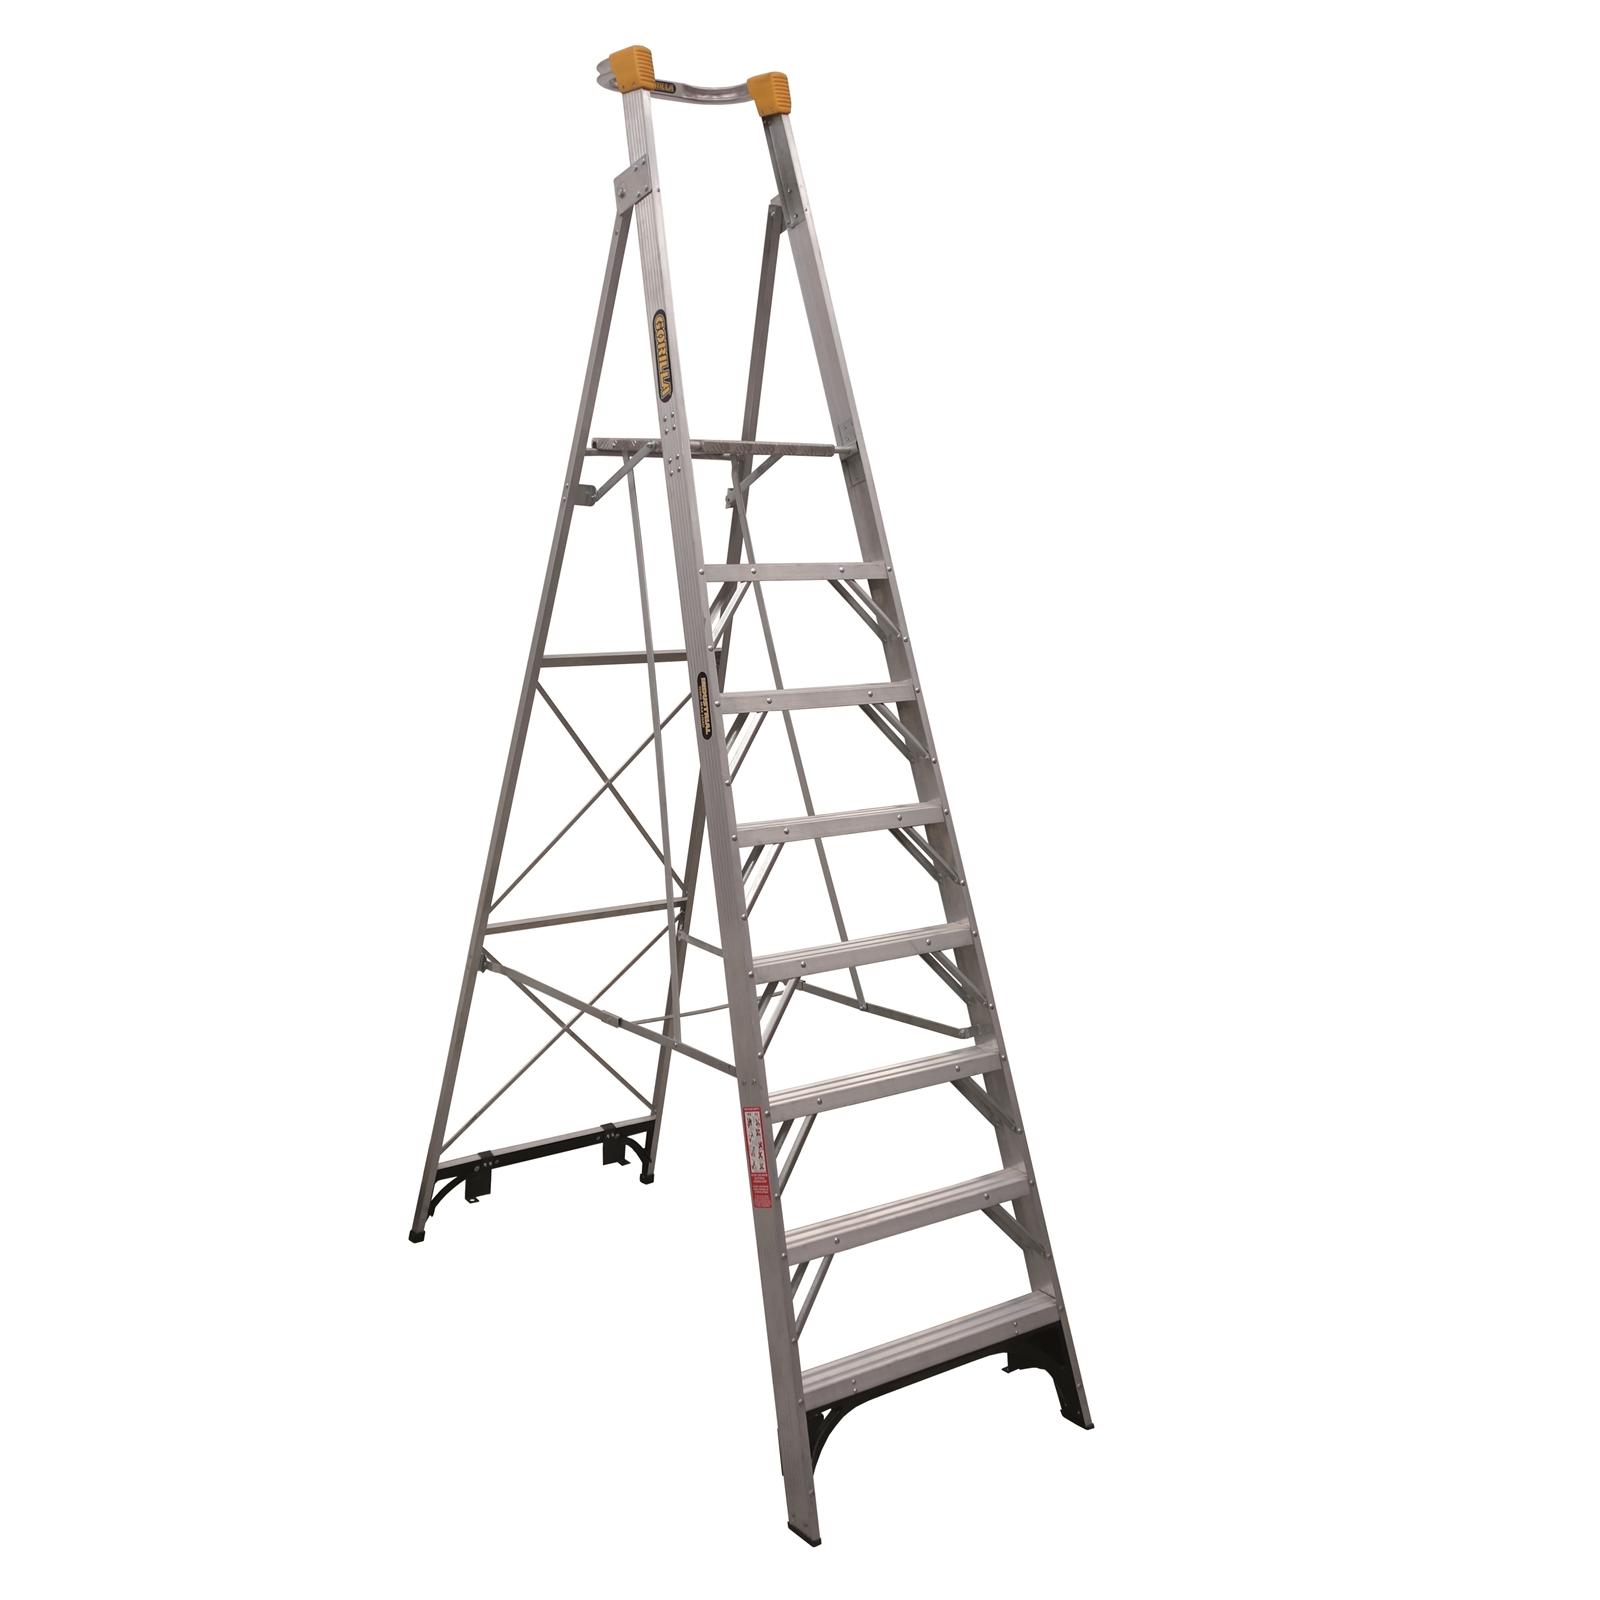 Gorilla Aluminium Platform Ladder 8 Steps 11ft 8ft 3 3m 2